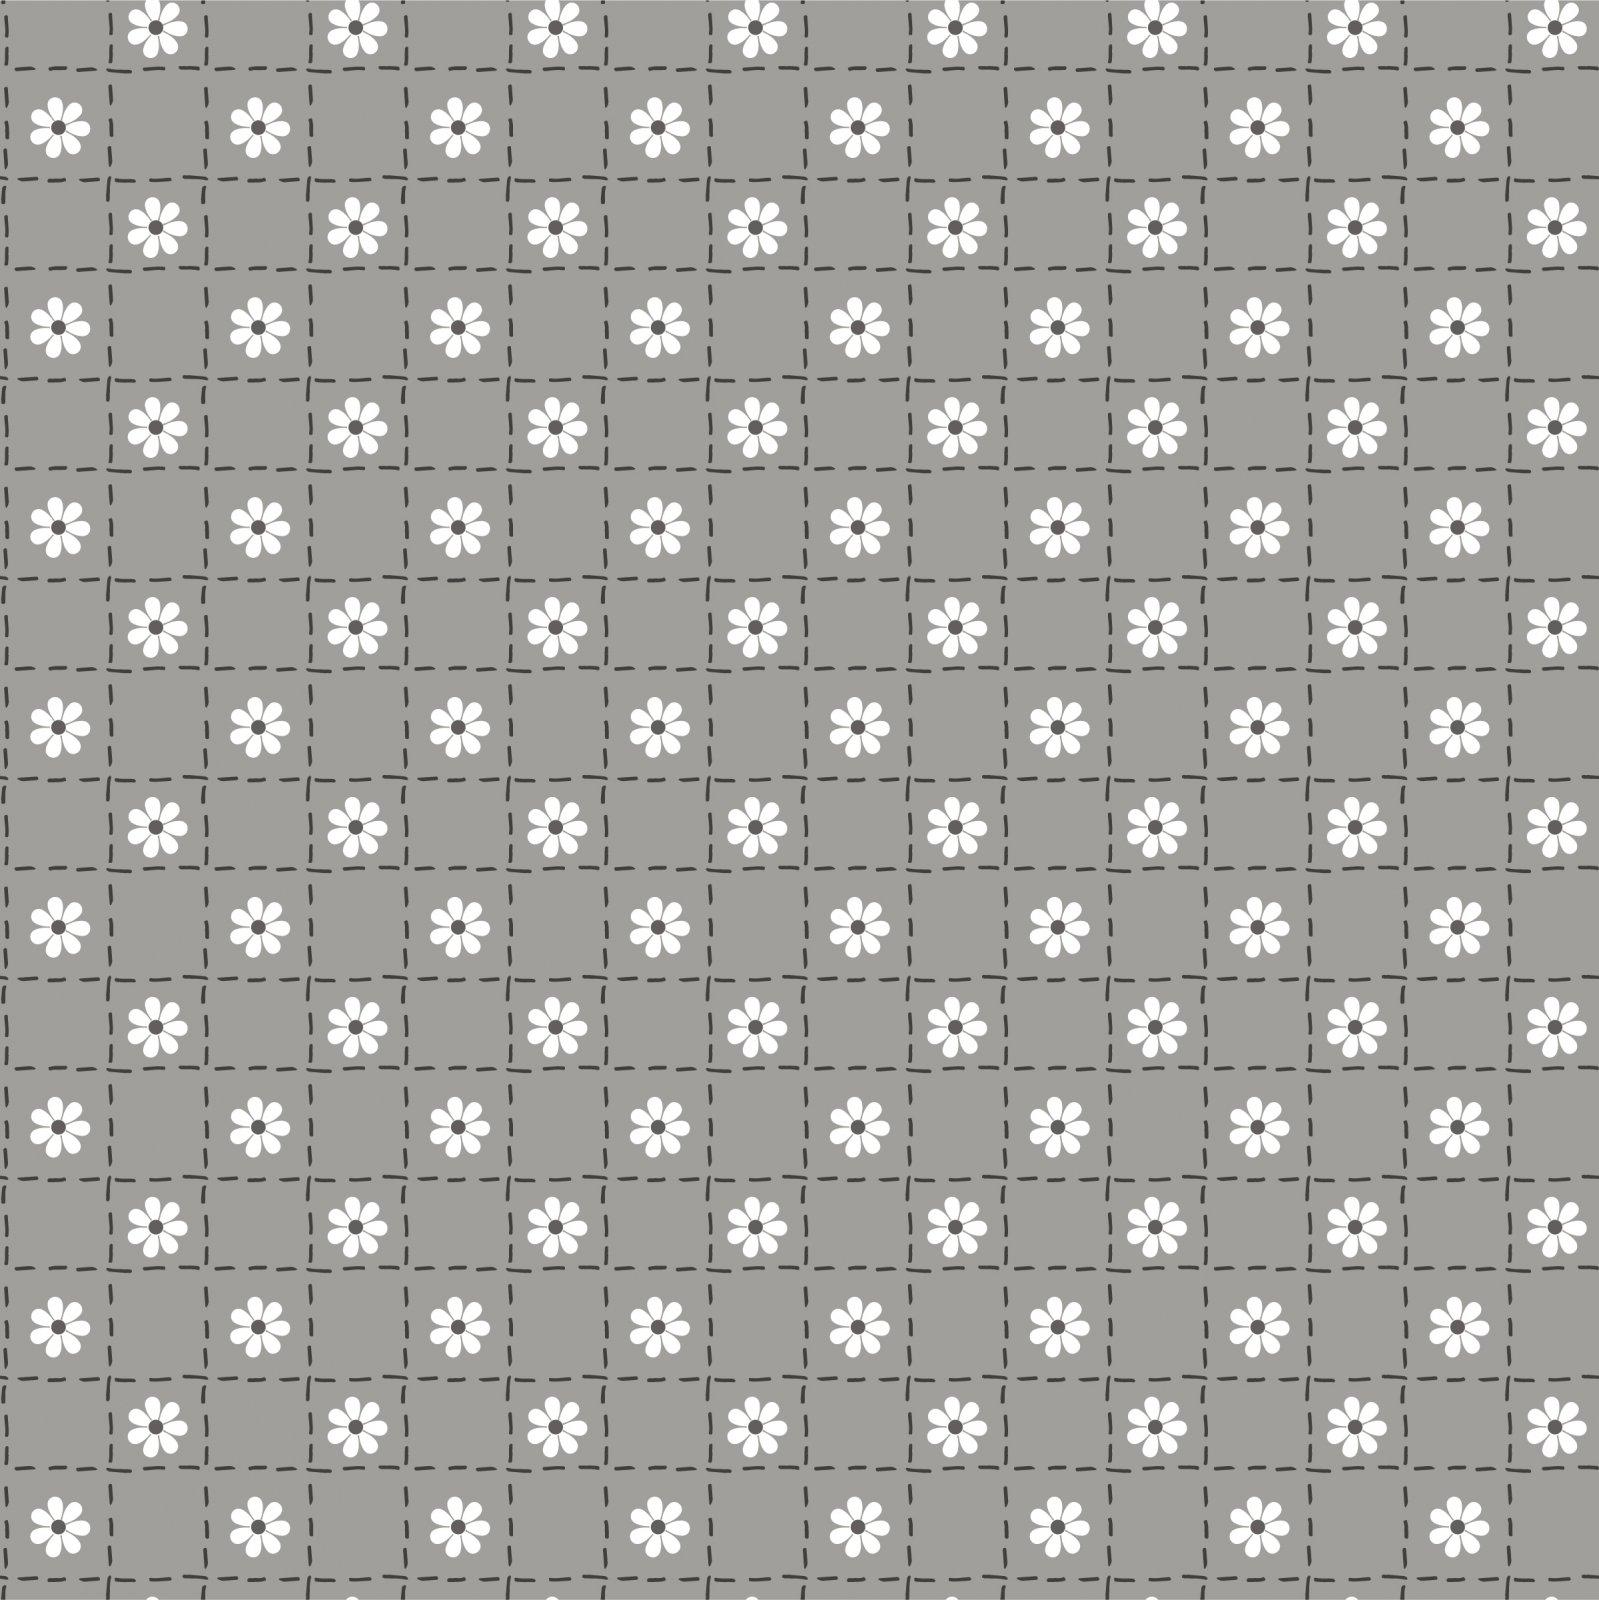 Shades of Grey 18504-GY